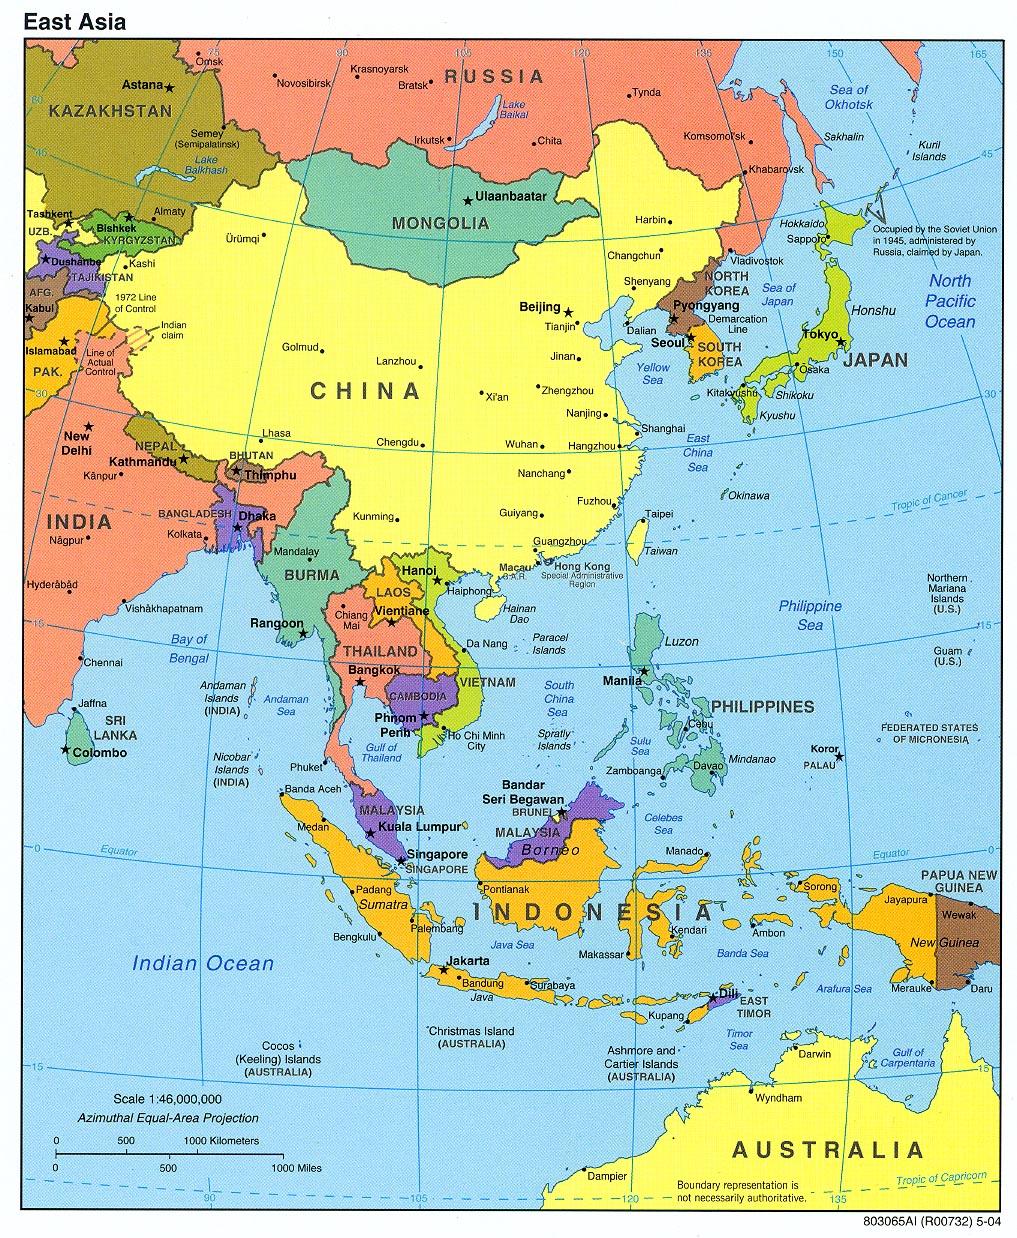 Karte Asien.Karte Ost Asien Reliefkarte Weltkarte Com Karten Und